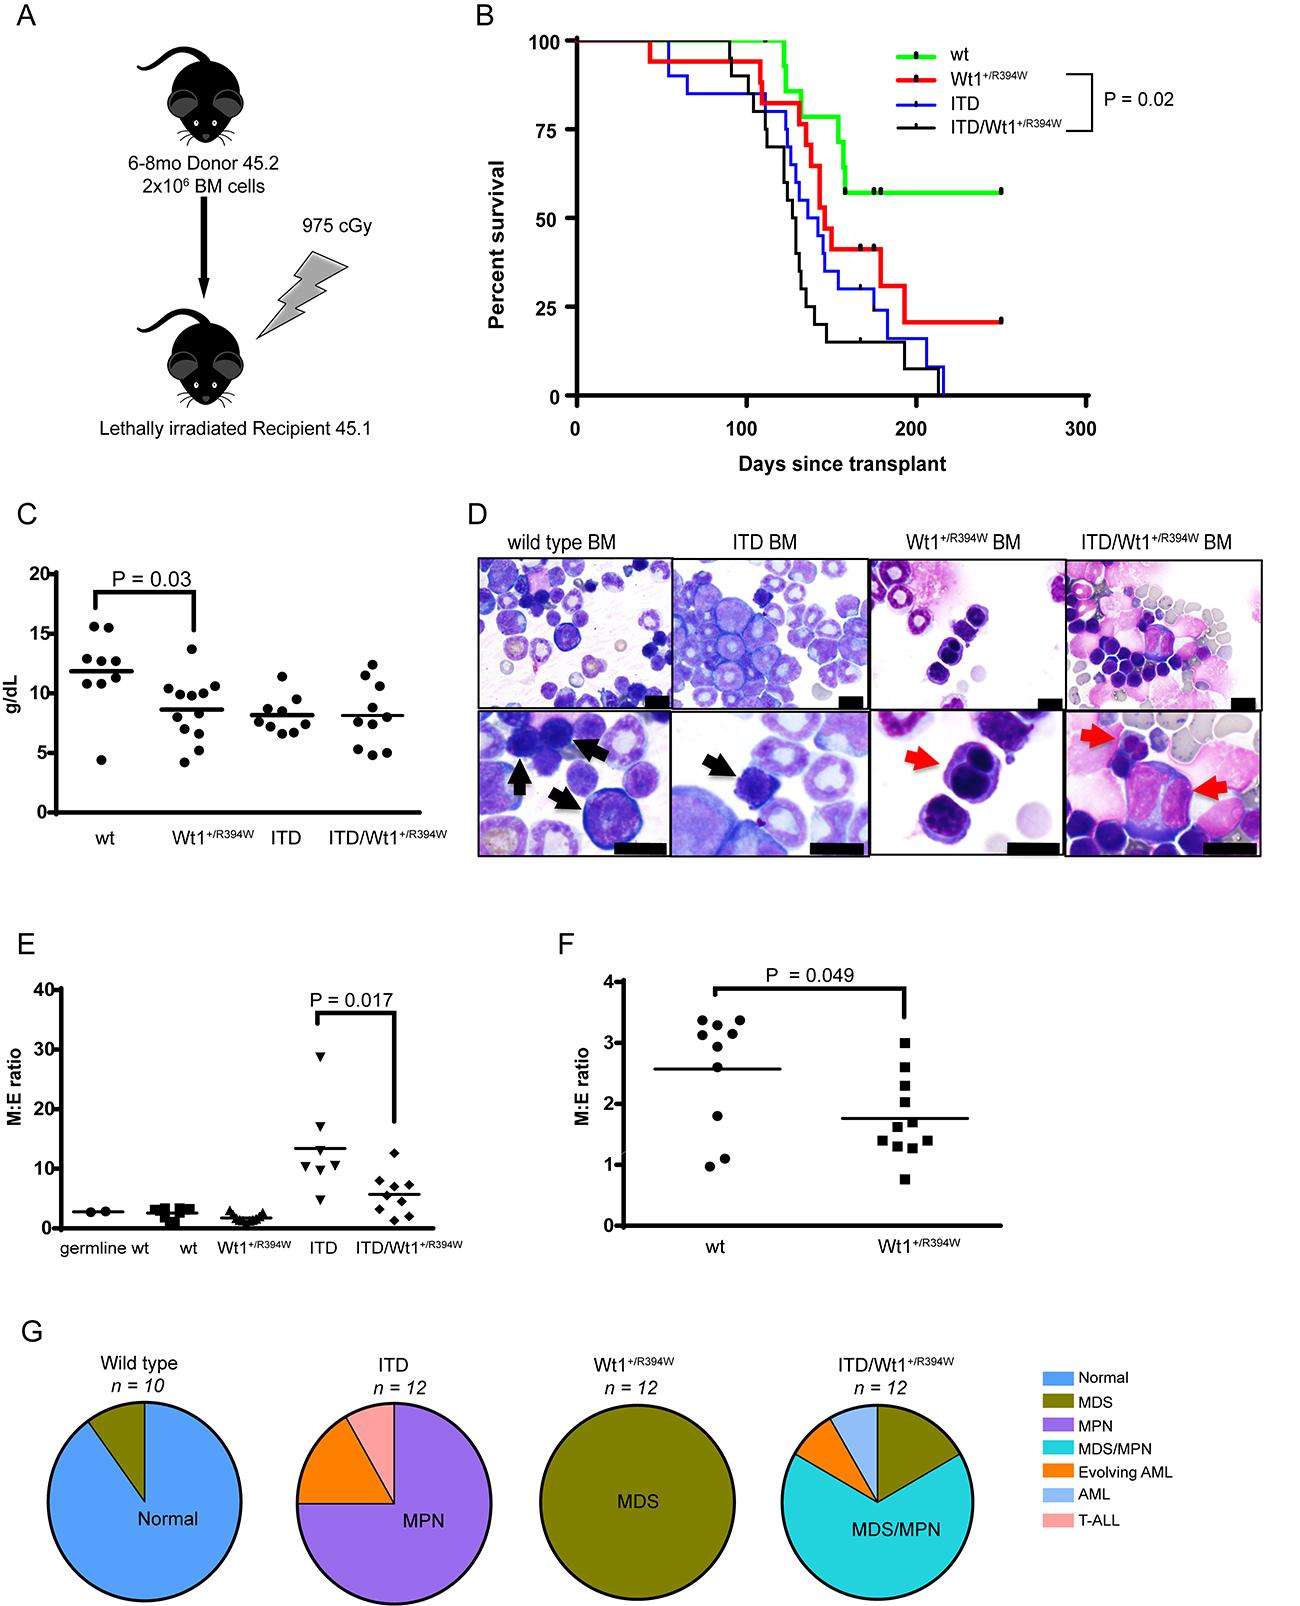 Hematologic characterization of a transplant model of Wt1+/R394W x Flt3+/ITD.